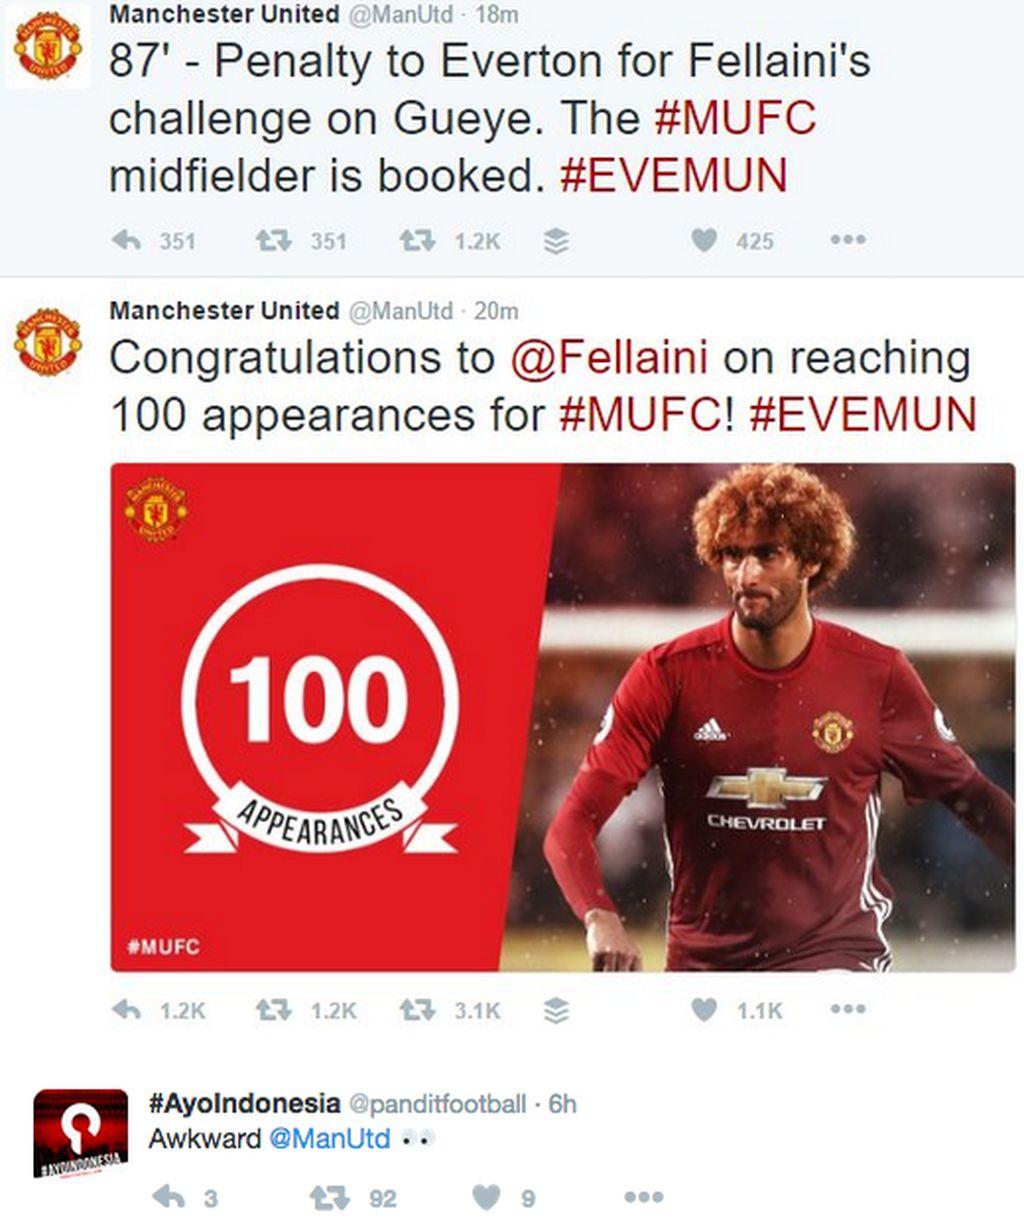 Di laga ke-100 bersama MU, Fellaini harusnya bikin rekor dengan mempertahankan kemenangan. Namun ia lebih memilih jadi pahlawan bagi Everton, mantan klub yang pernah lama dibelanya. Foto: Meme on Twitter